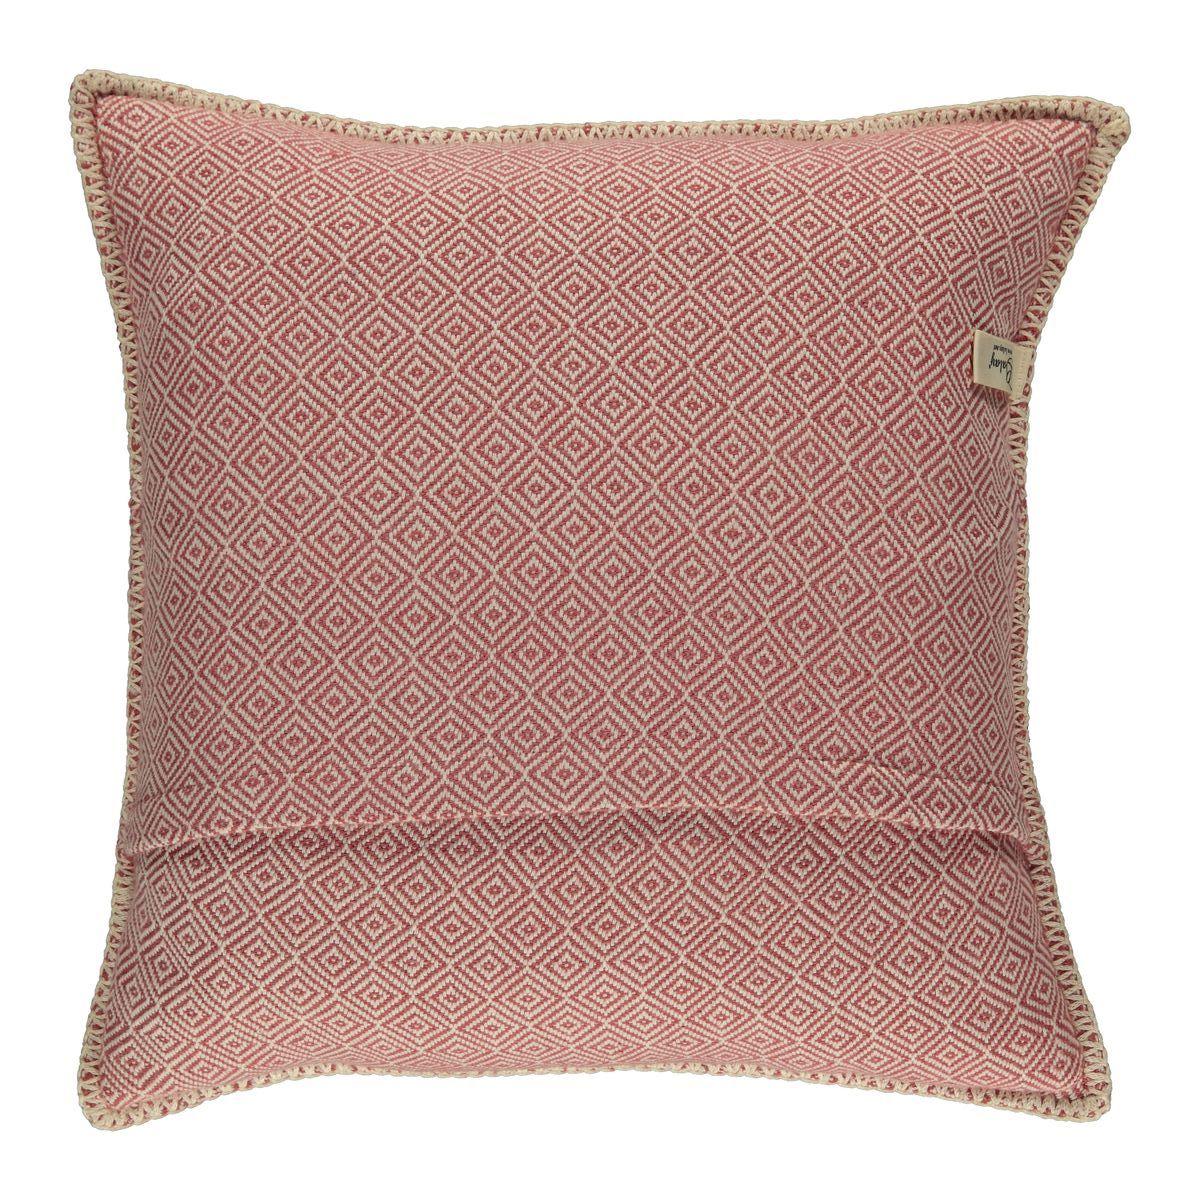 Cushion cover / Diamond - Dusty Rose / 40x40